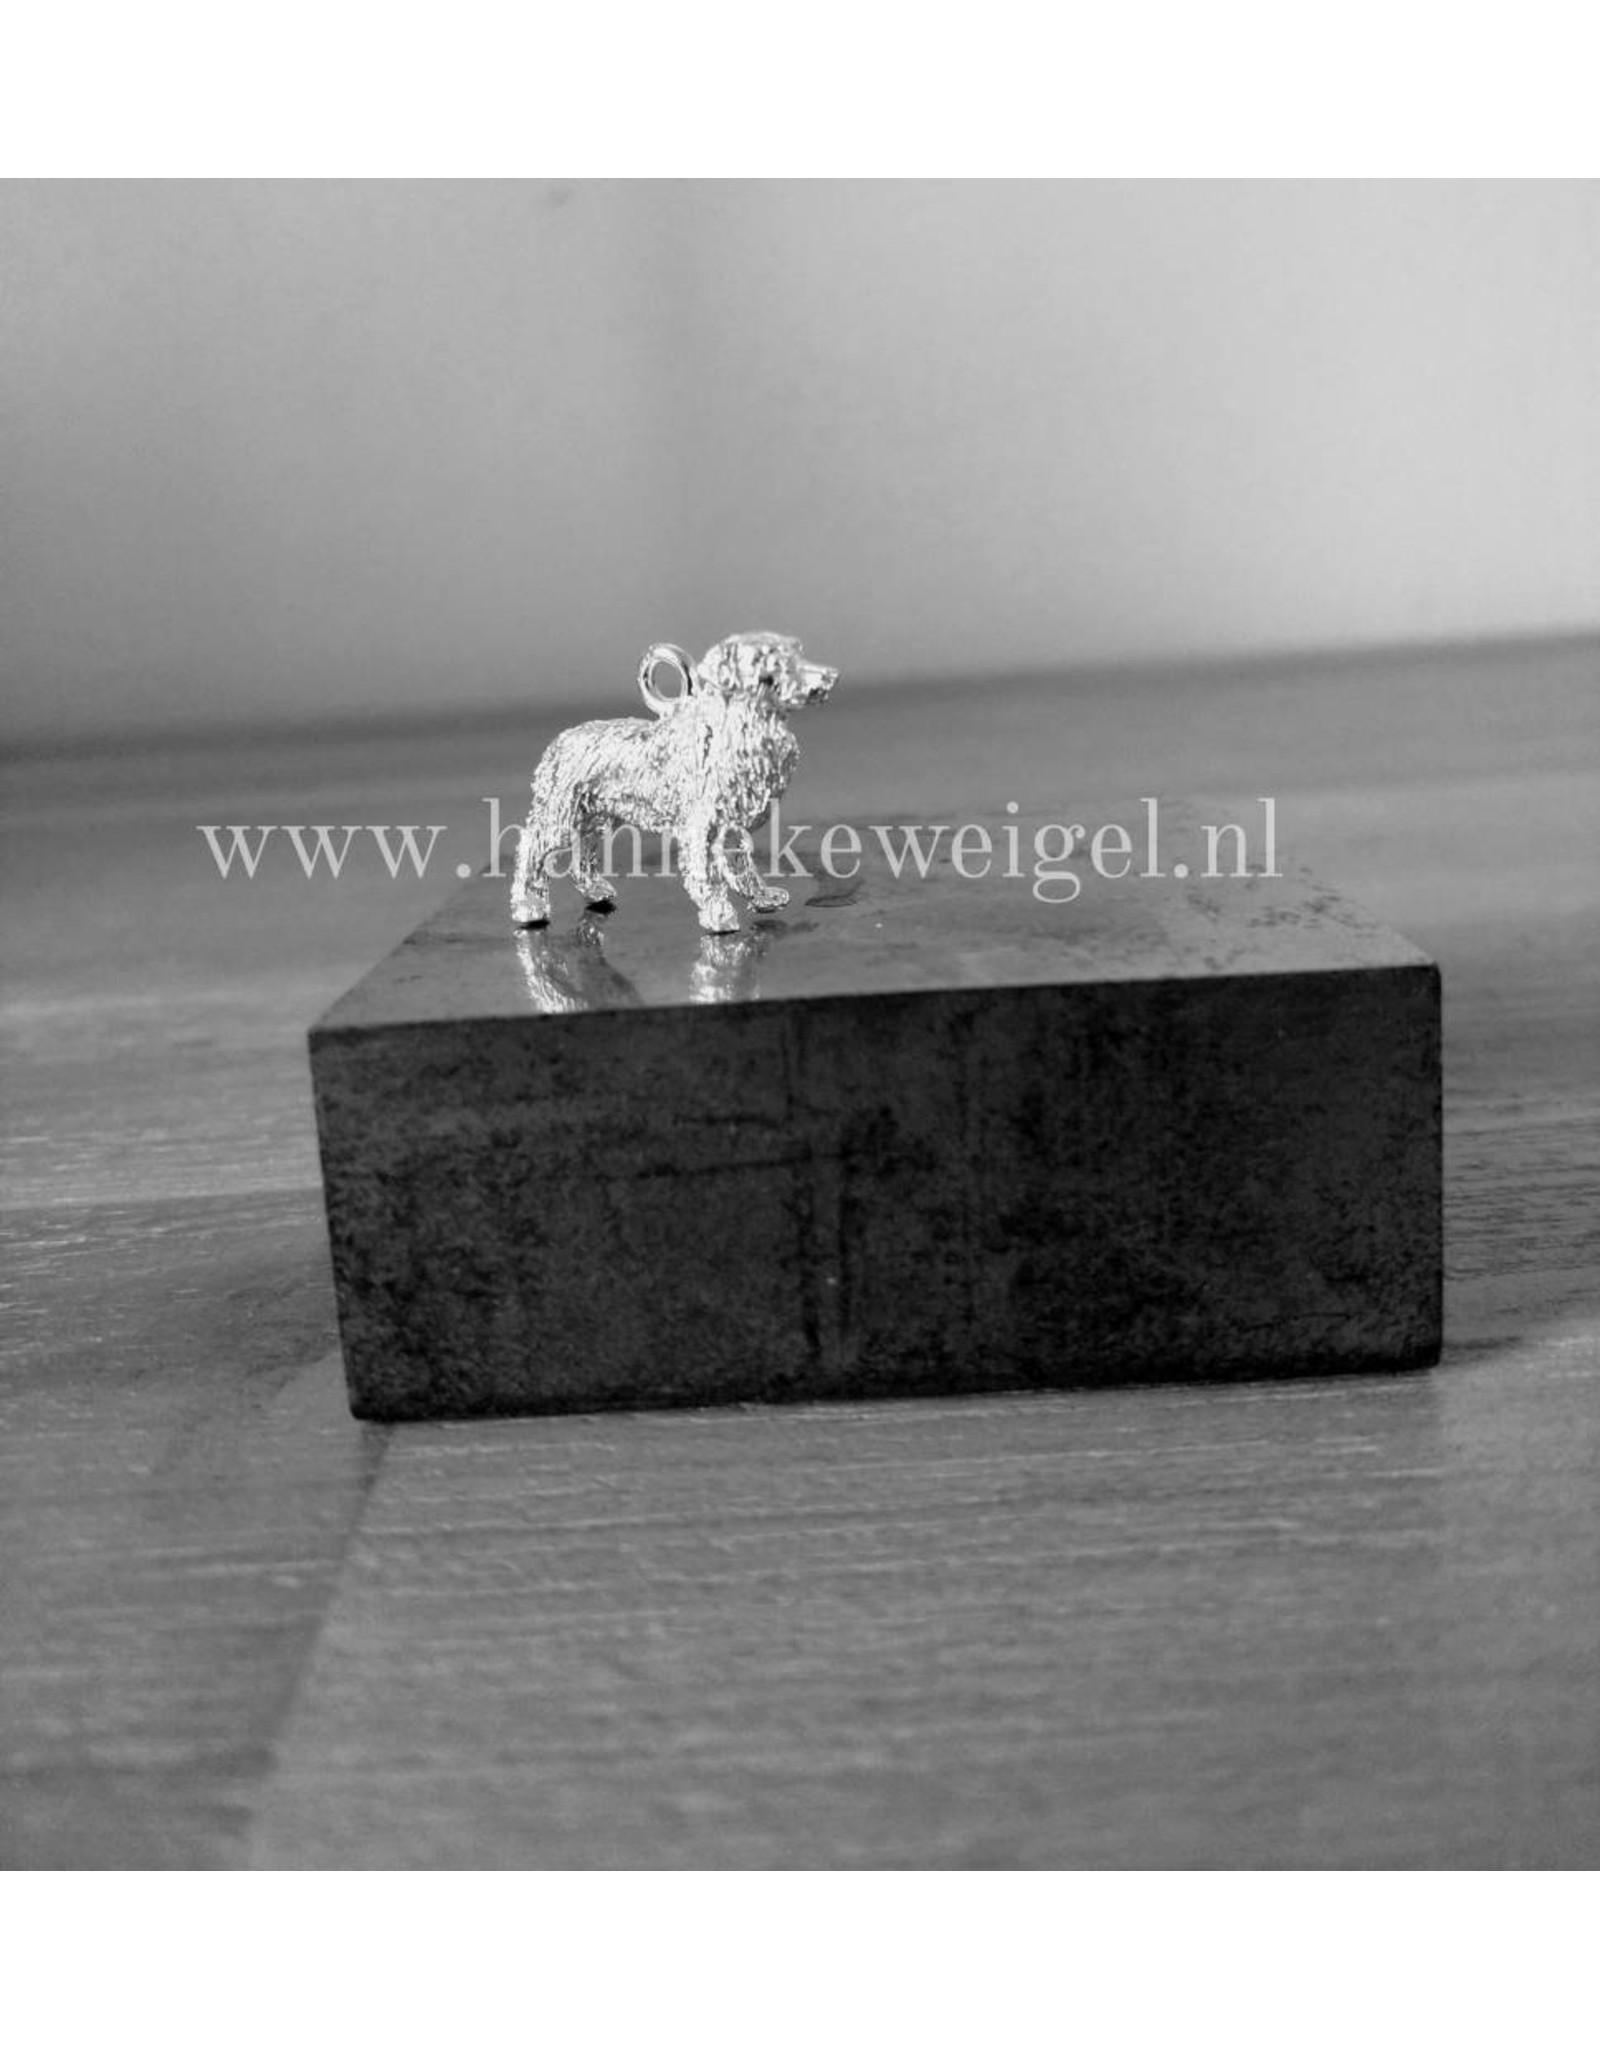 Handmade by Hanneke Weigel Zilveren Nova scotia duck tolling retriever